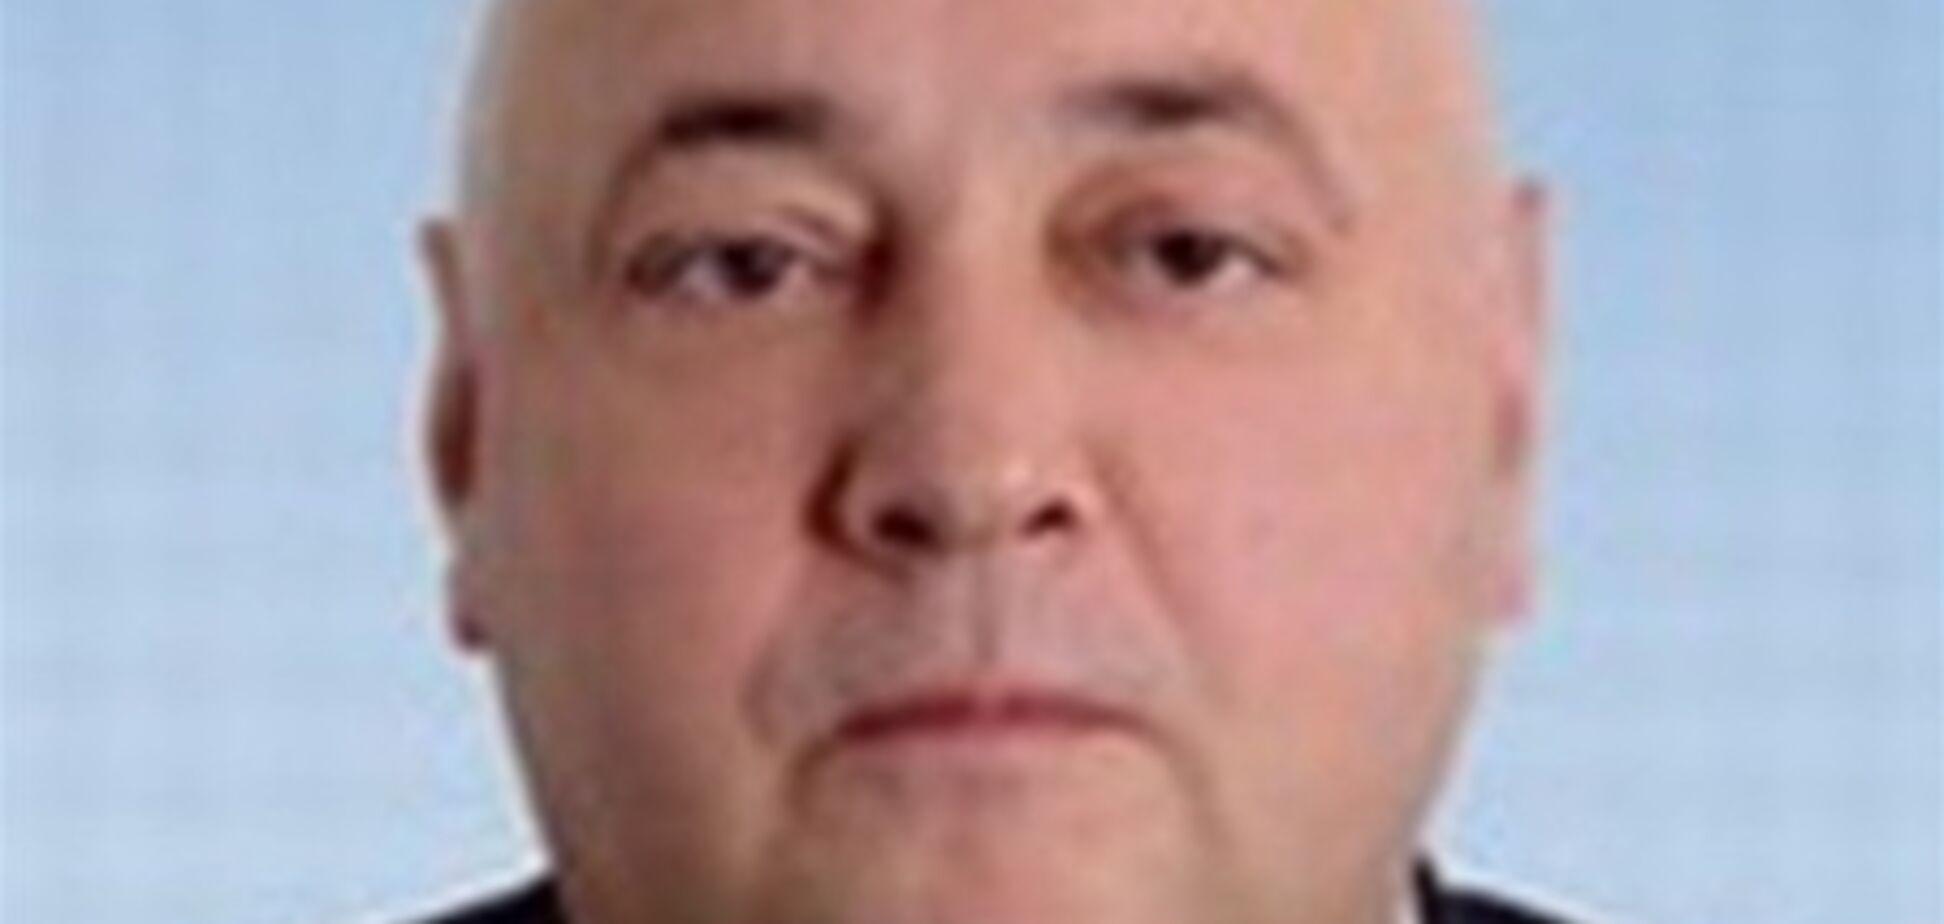 Милиция назвала официальную причину смерти депутата из блока Литвина